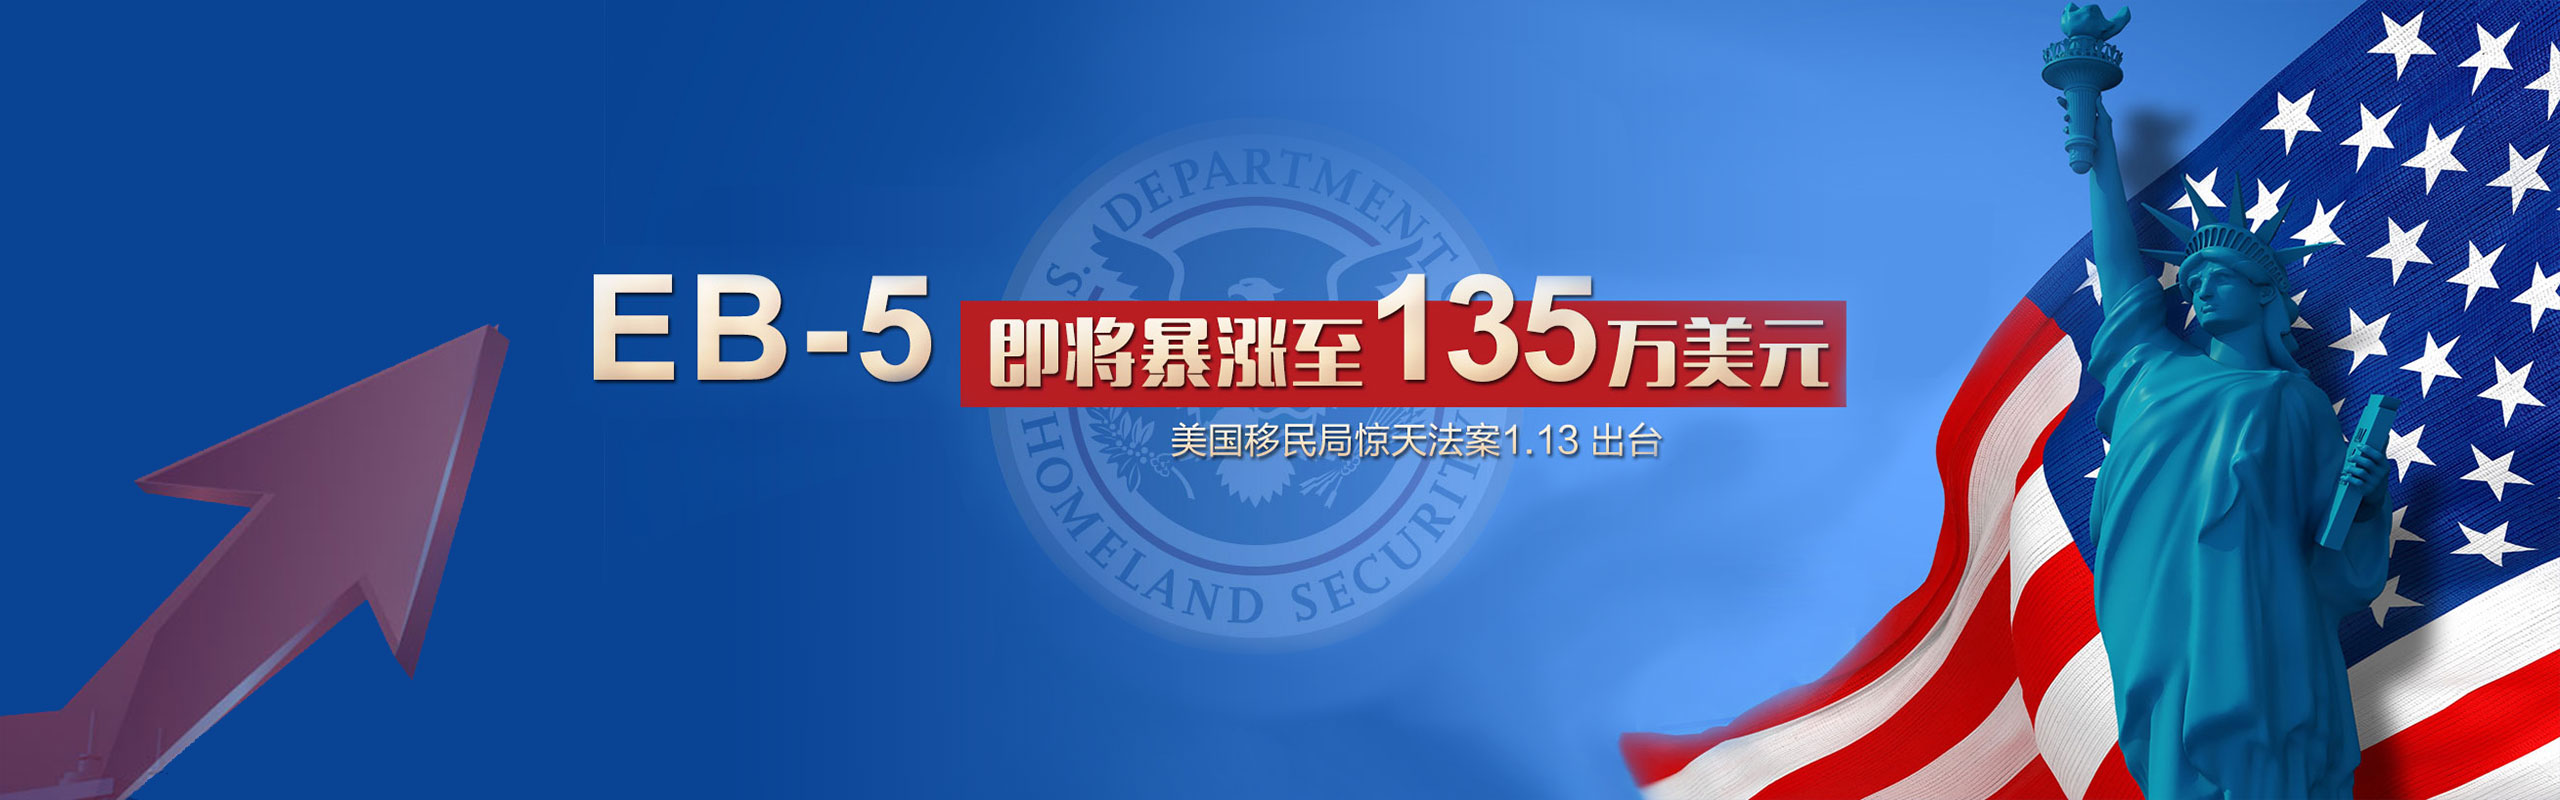 EB-5 即将暴涨到135万美元!<br/>美国移民局惊天法案1月13日出台!